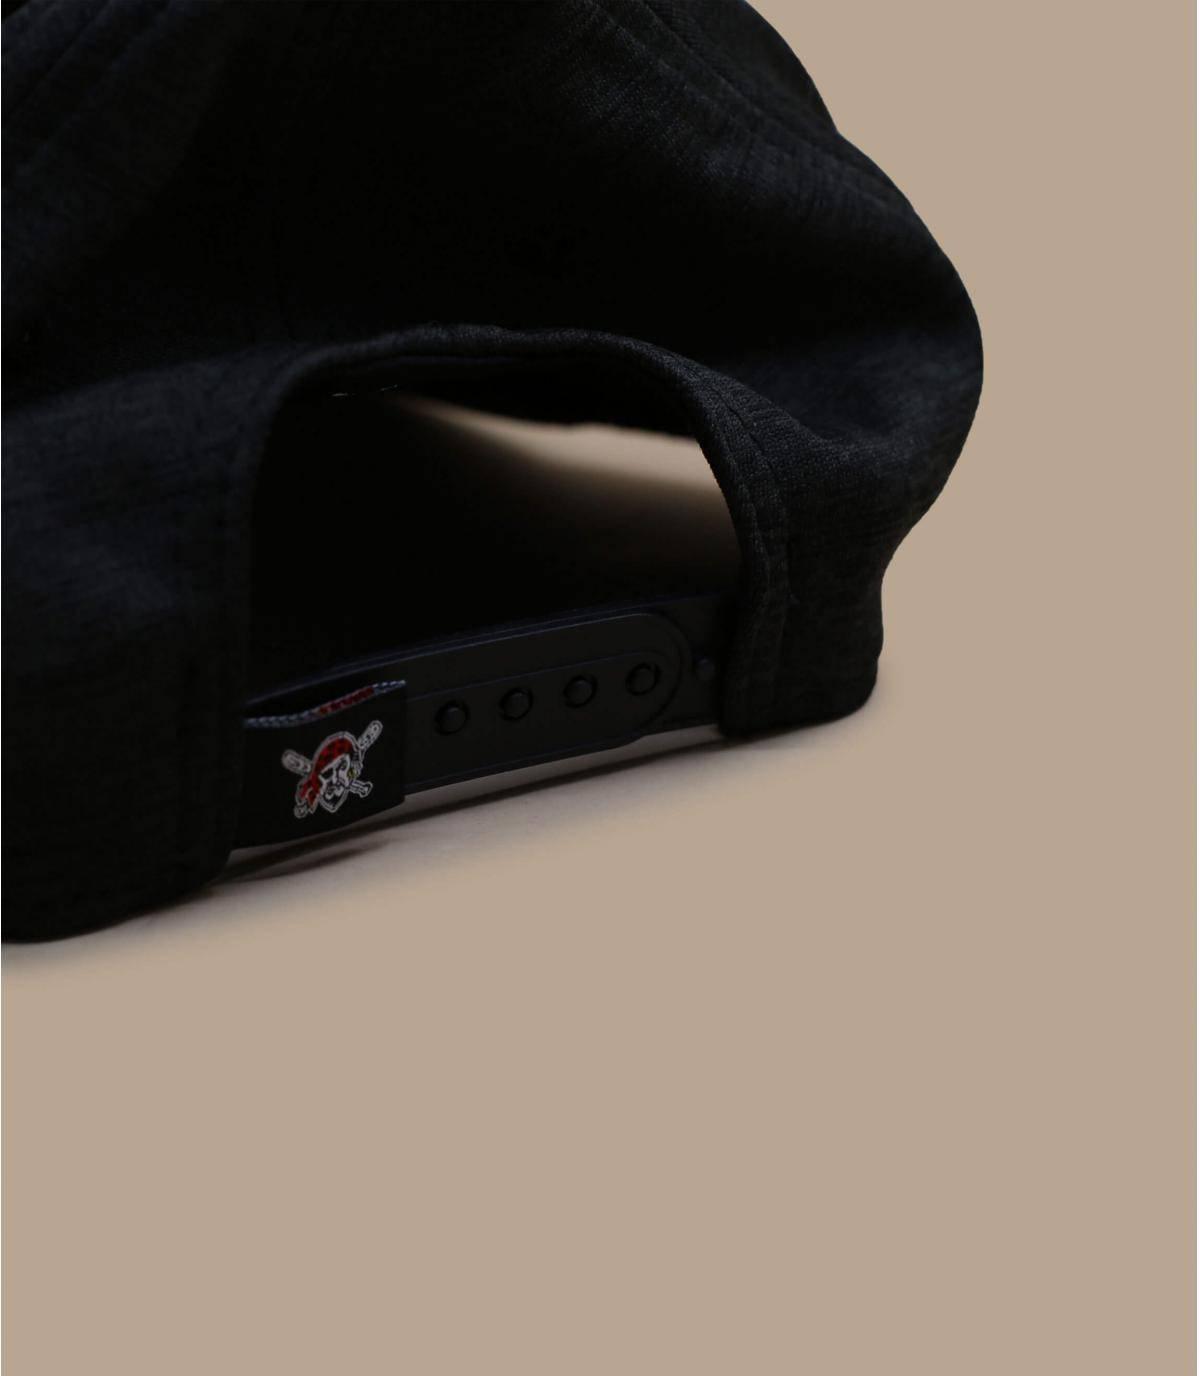 Details Shadow Tech Pop 950 Pirates - afbeeling 4